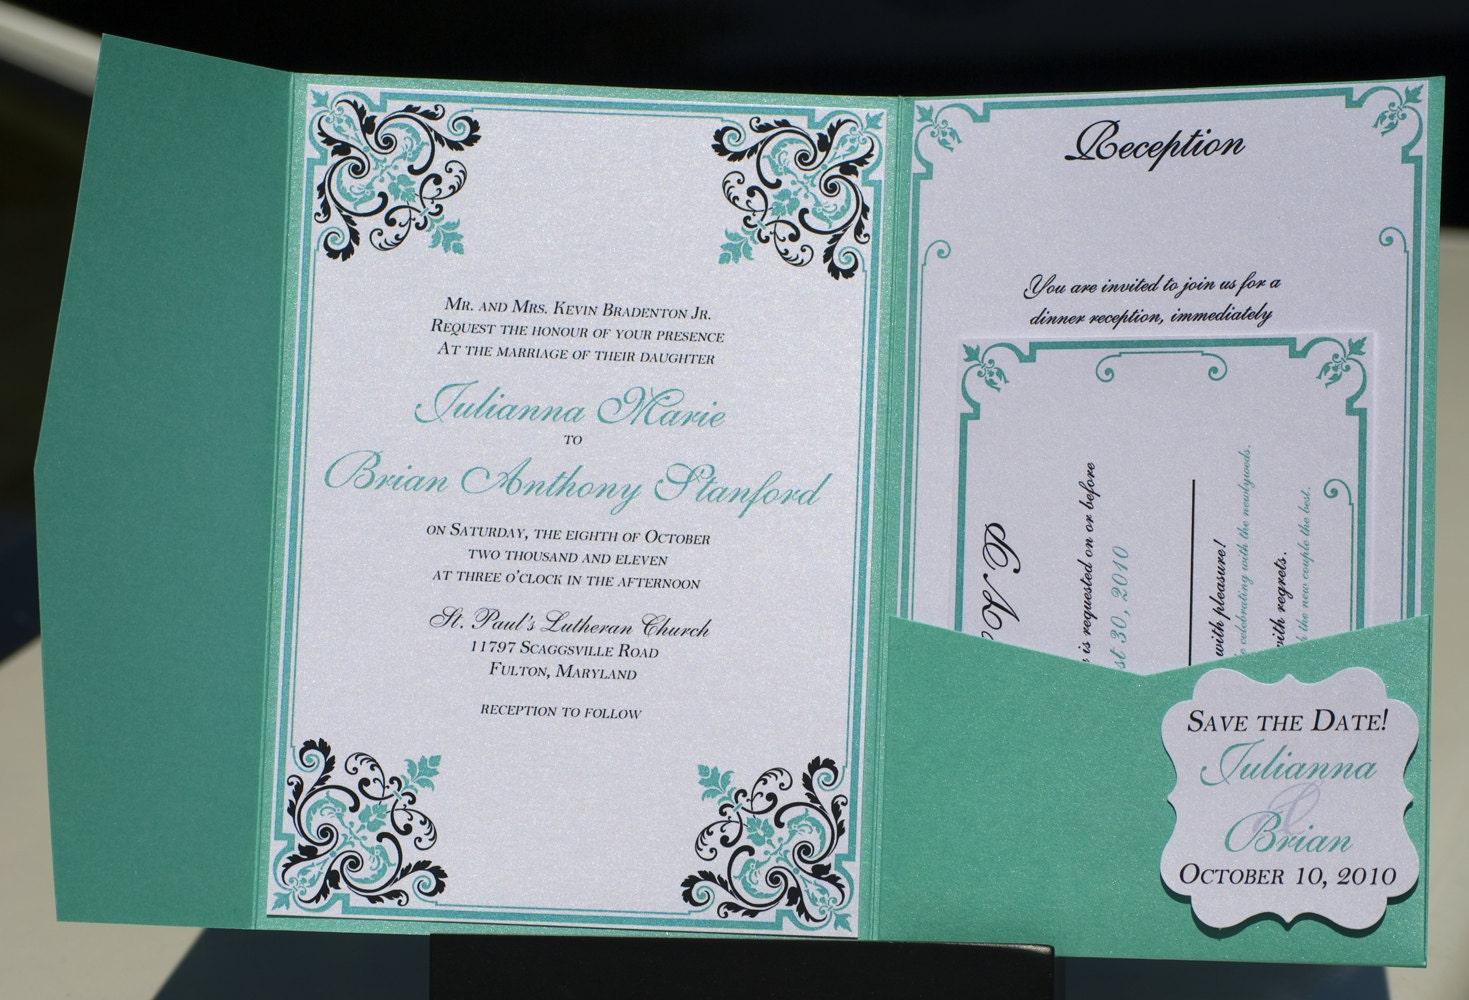 Wedding Invitations Turquoise: Turquoise Blue Wedding Invitation Pocketfold With By